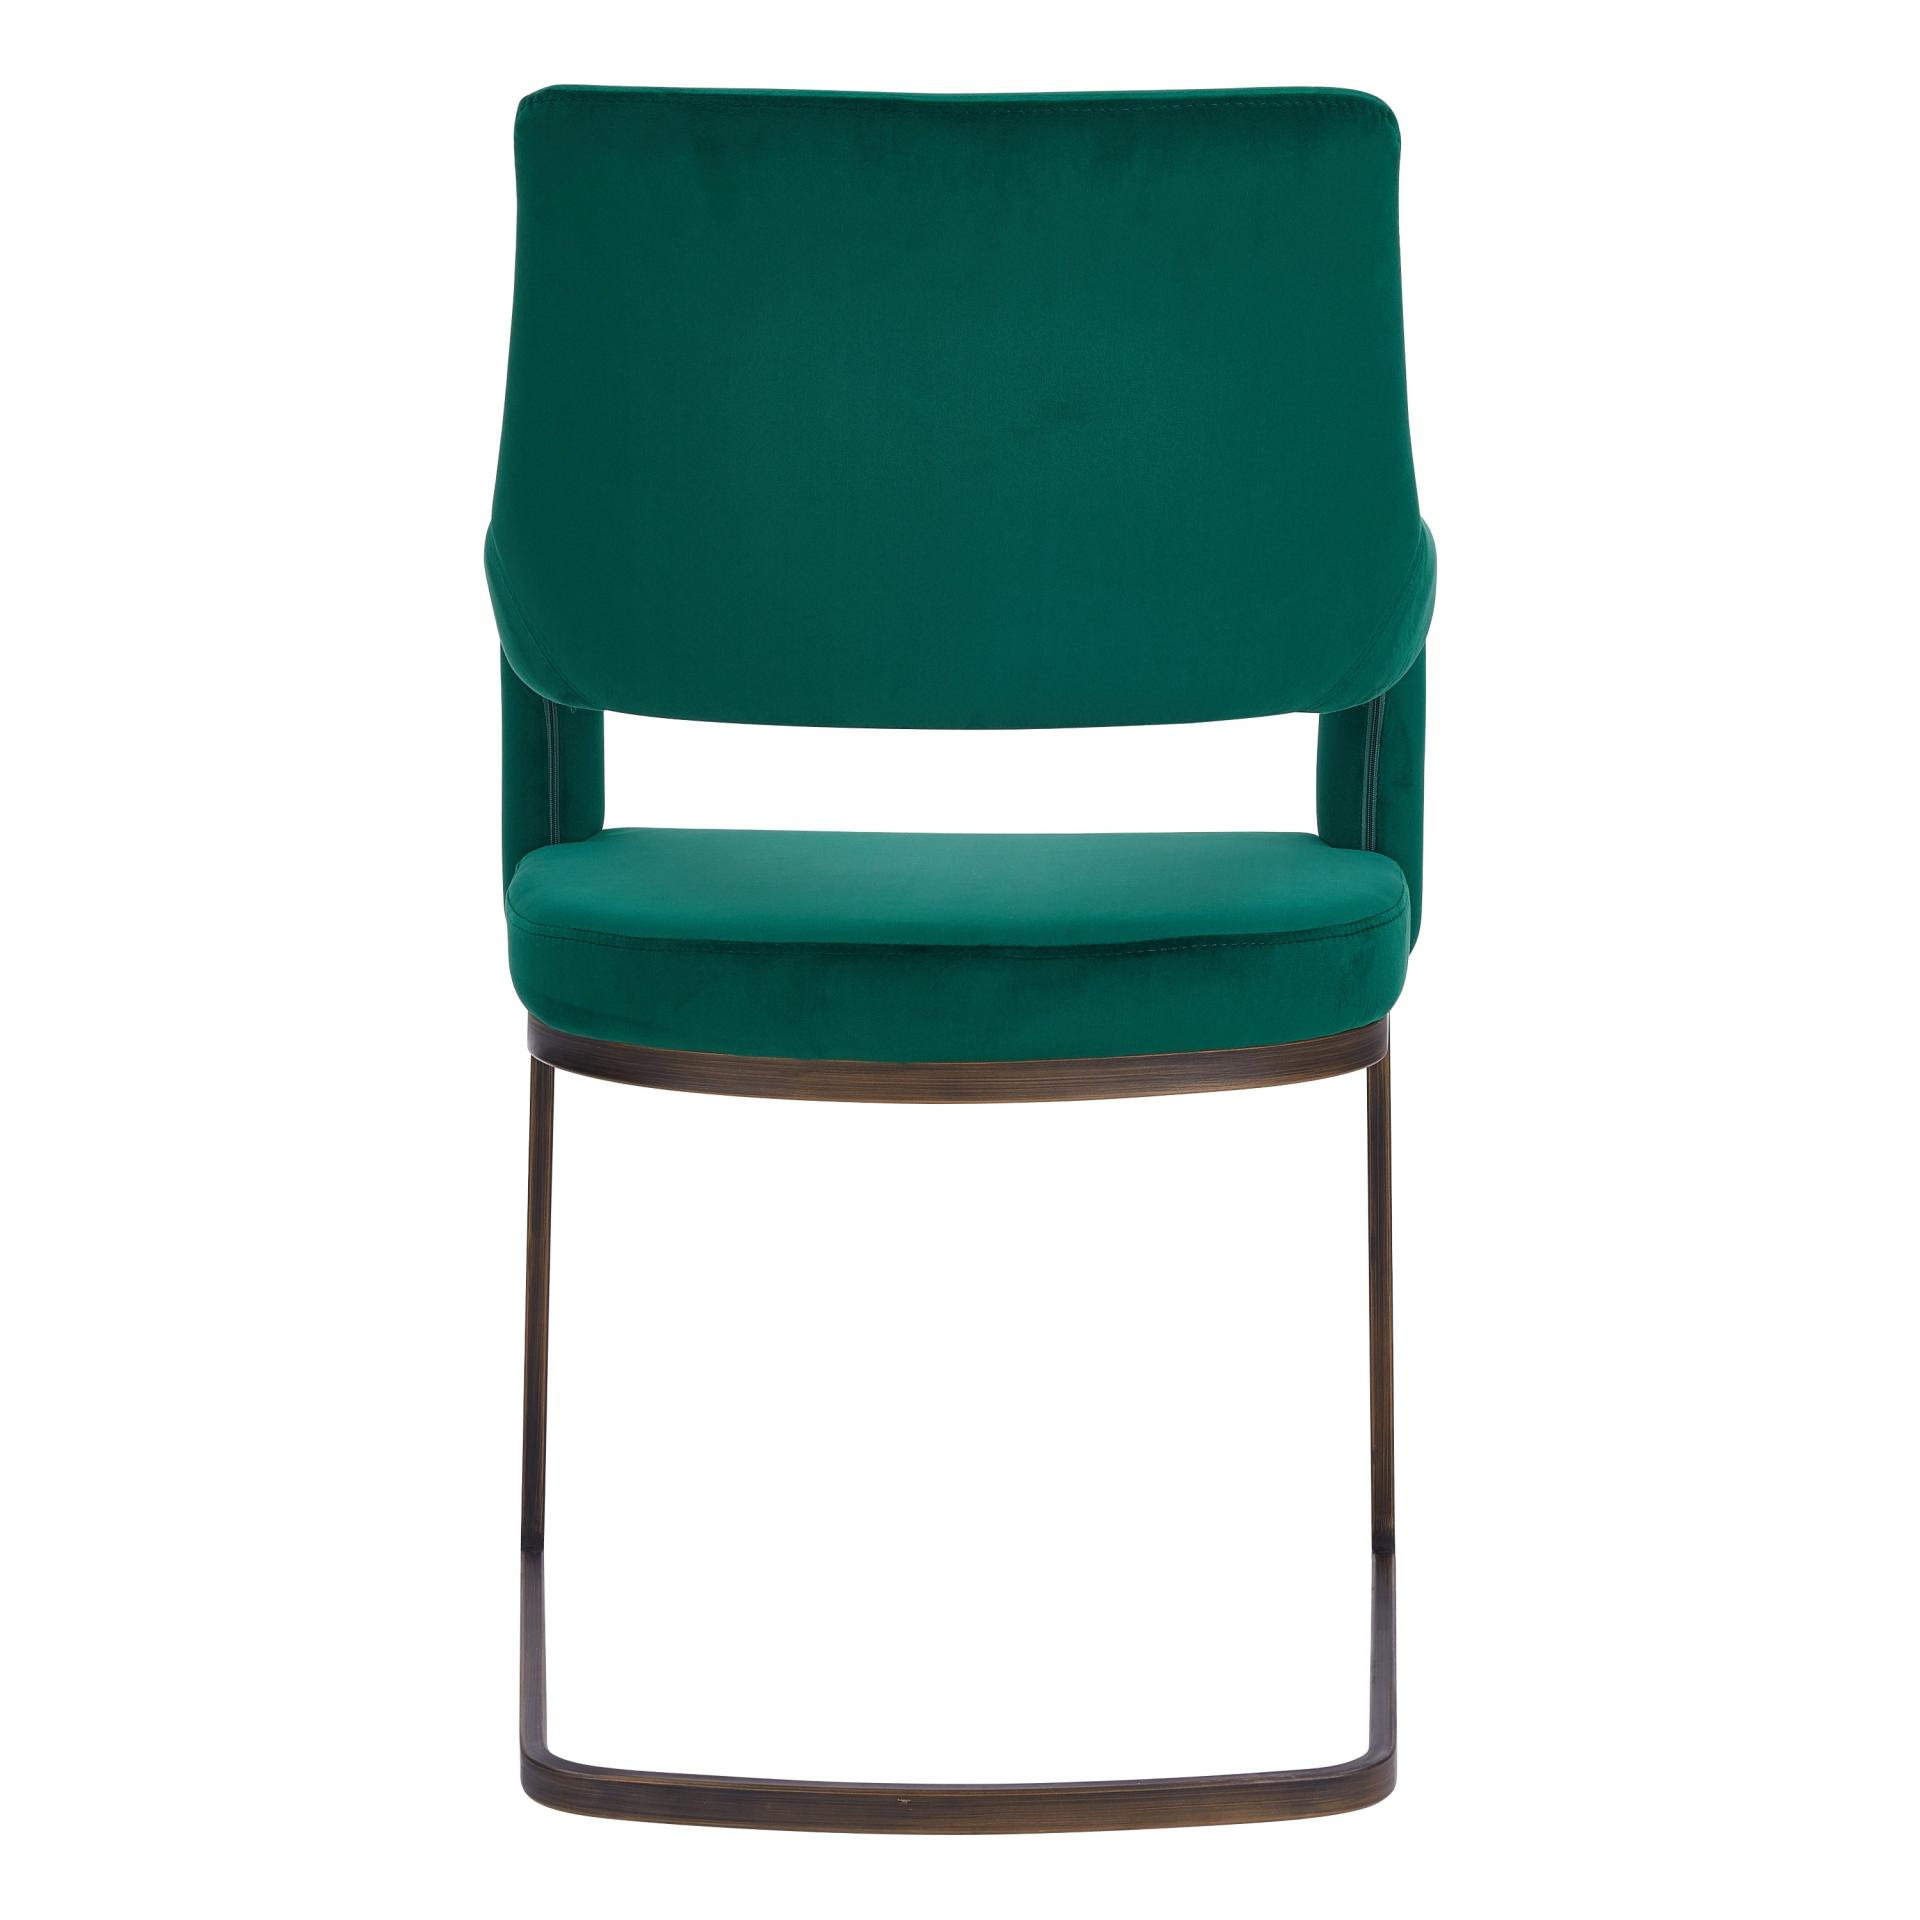 1060010 362 Npd Home Furniture Wholesale Lifestyle